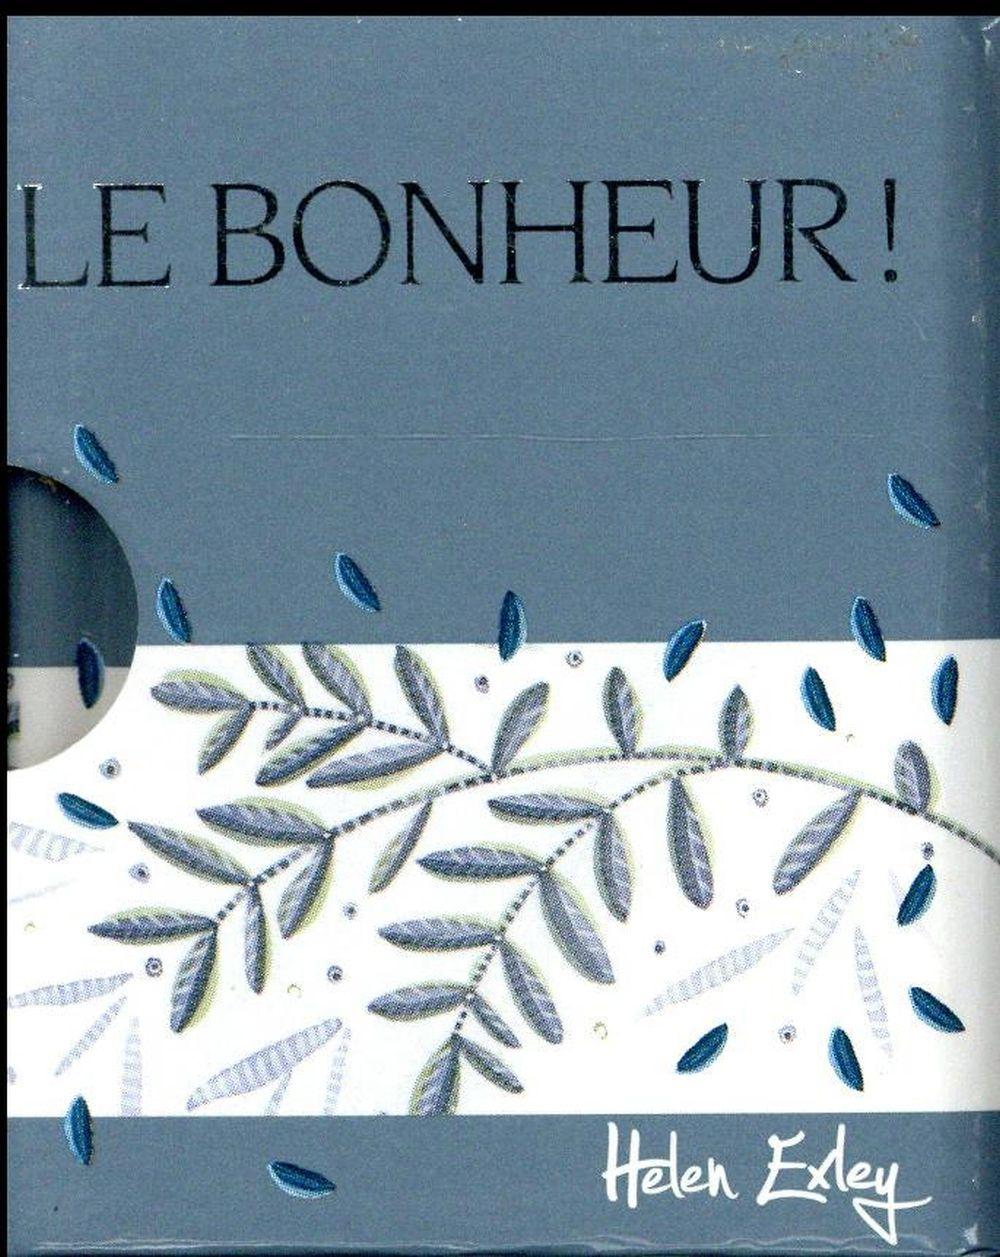 LE BONHEUR !